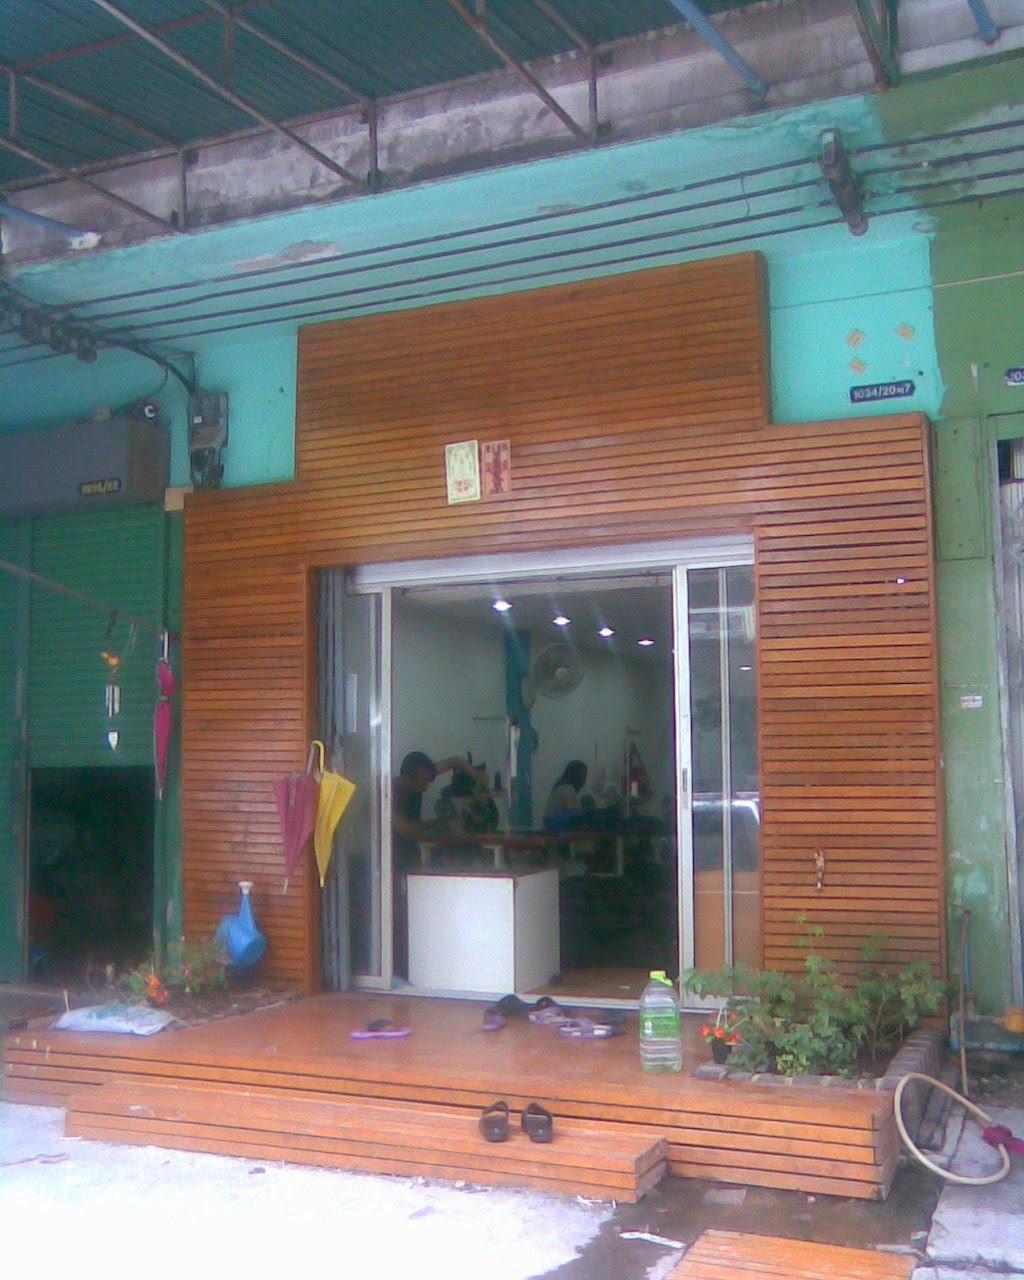 FB Design หมู่บ้านศรีเพชร หนองค้างพลู กทม.